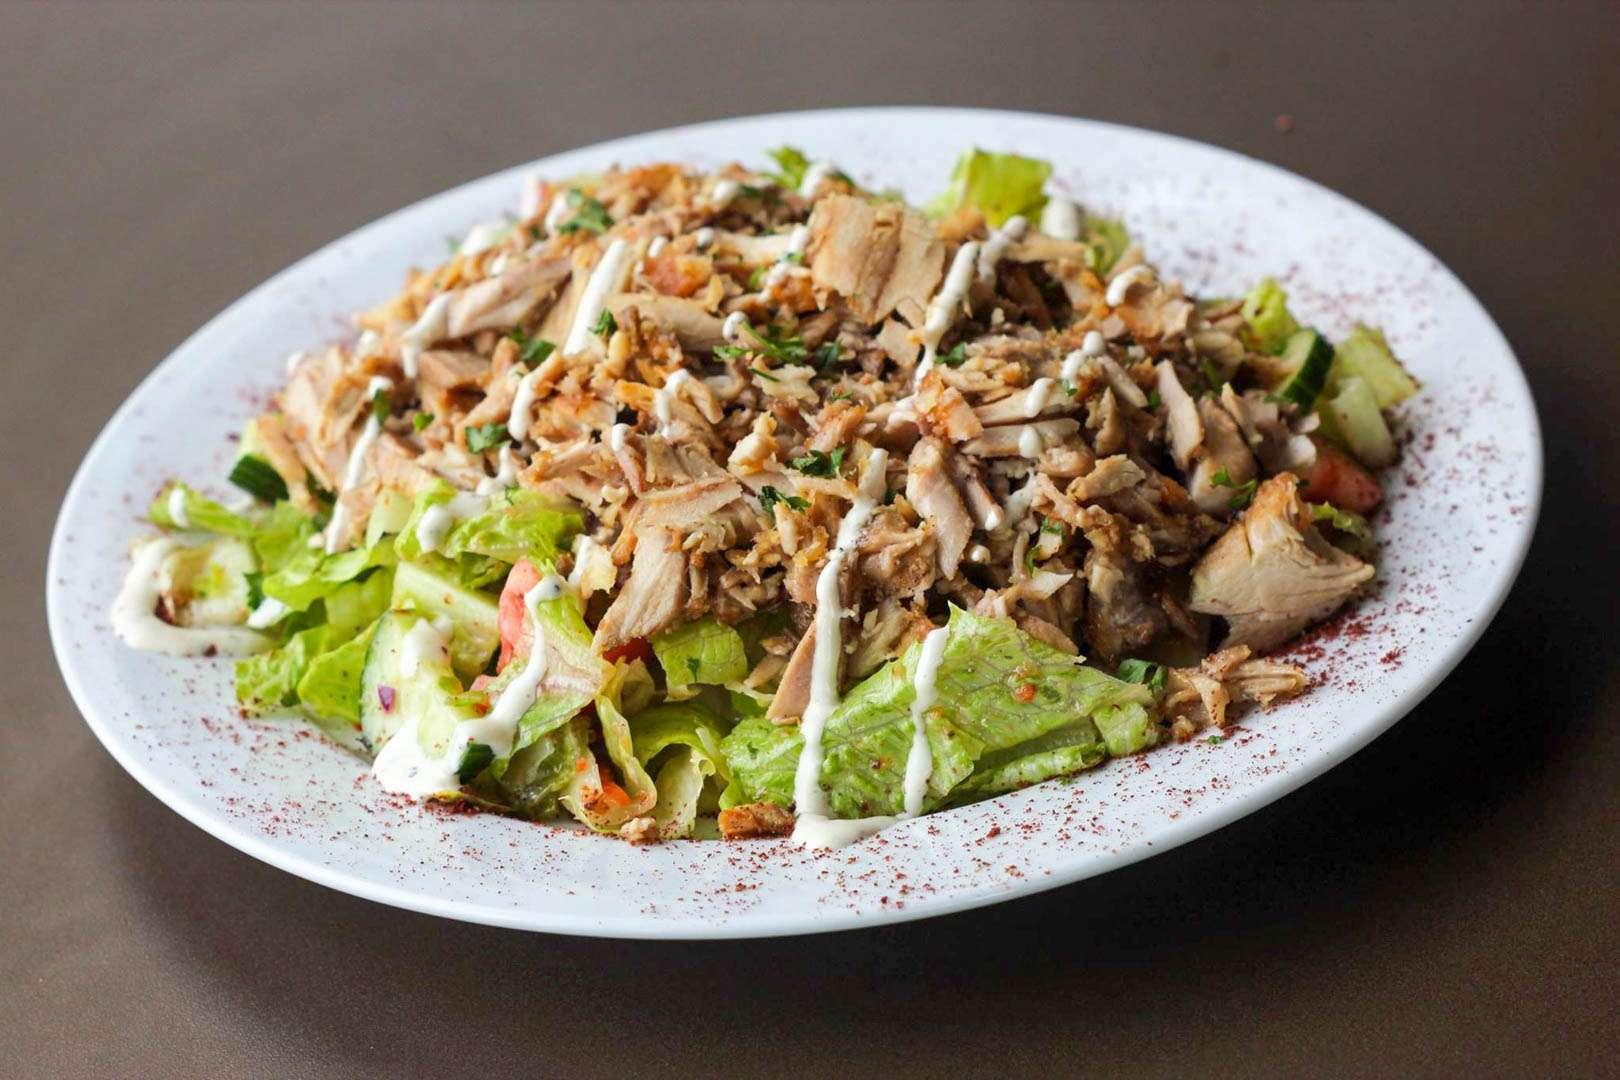 palmyra-chicken-salad